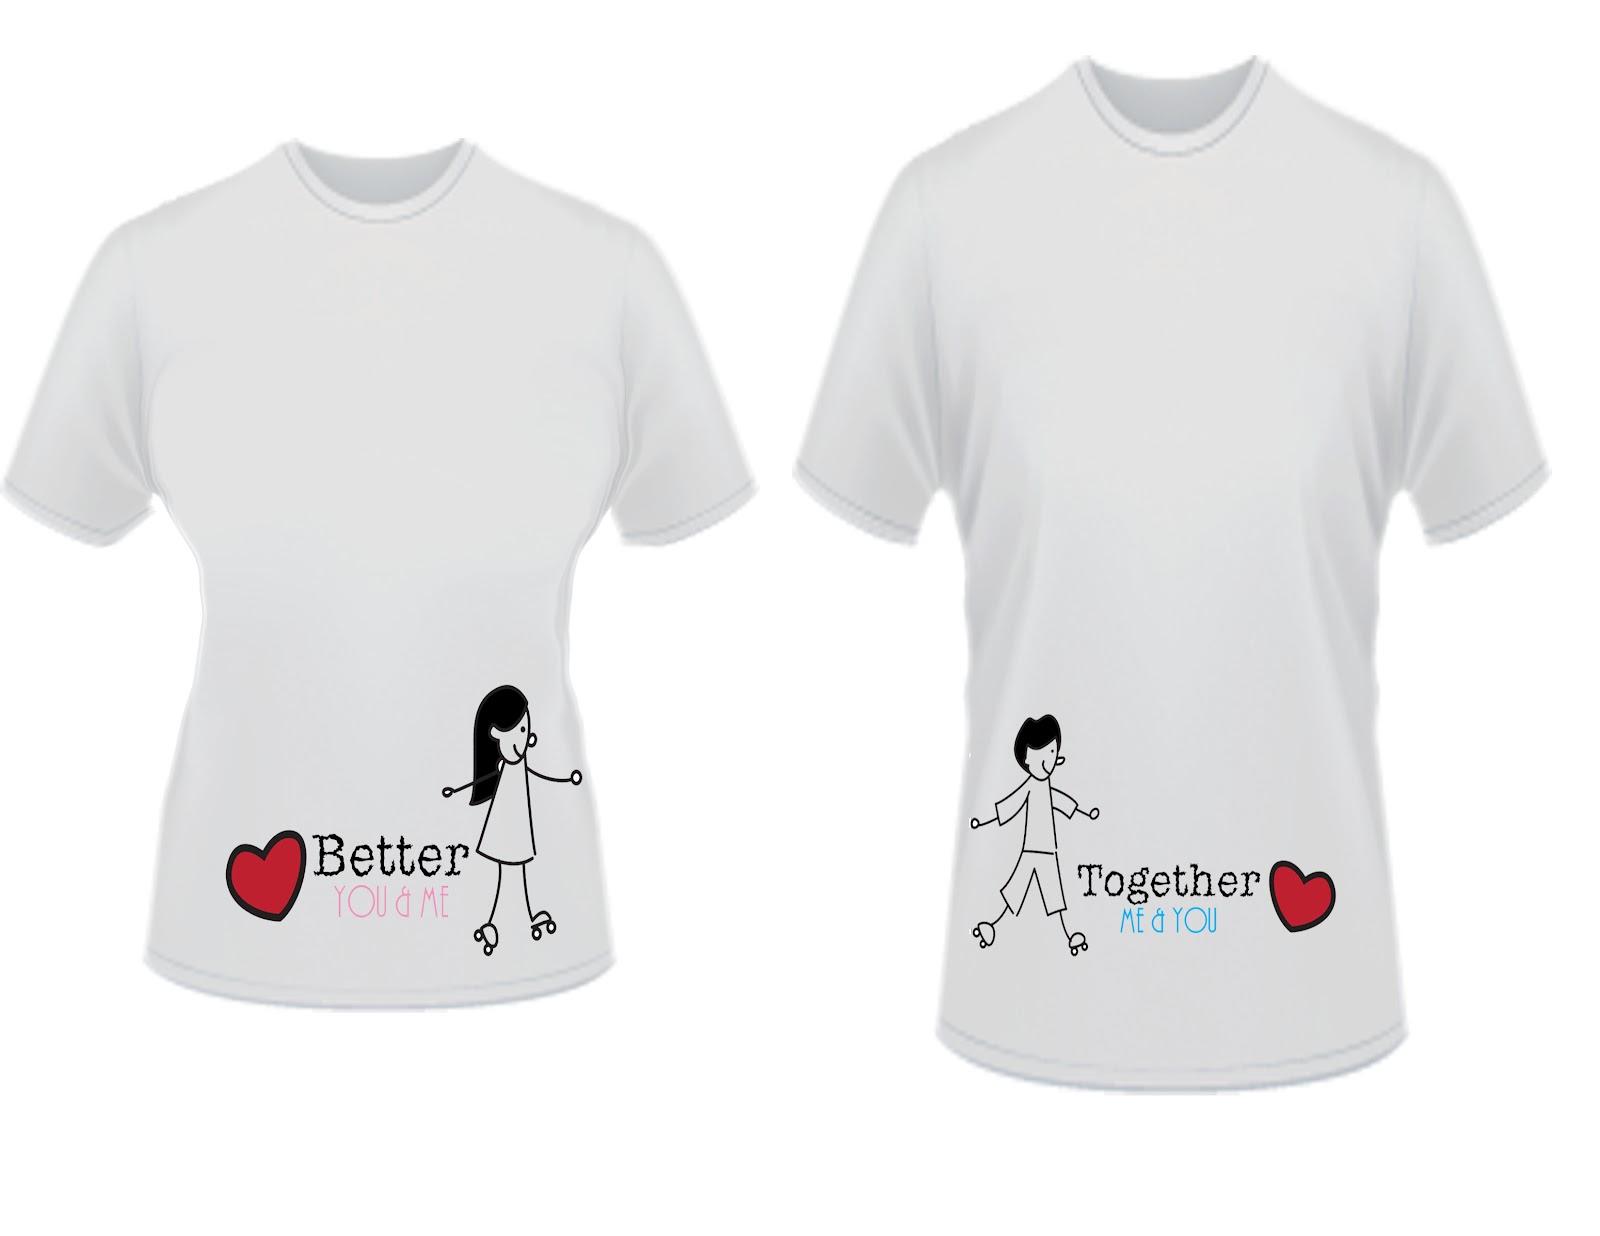 Best T Shirt Design For Couple Anlis